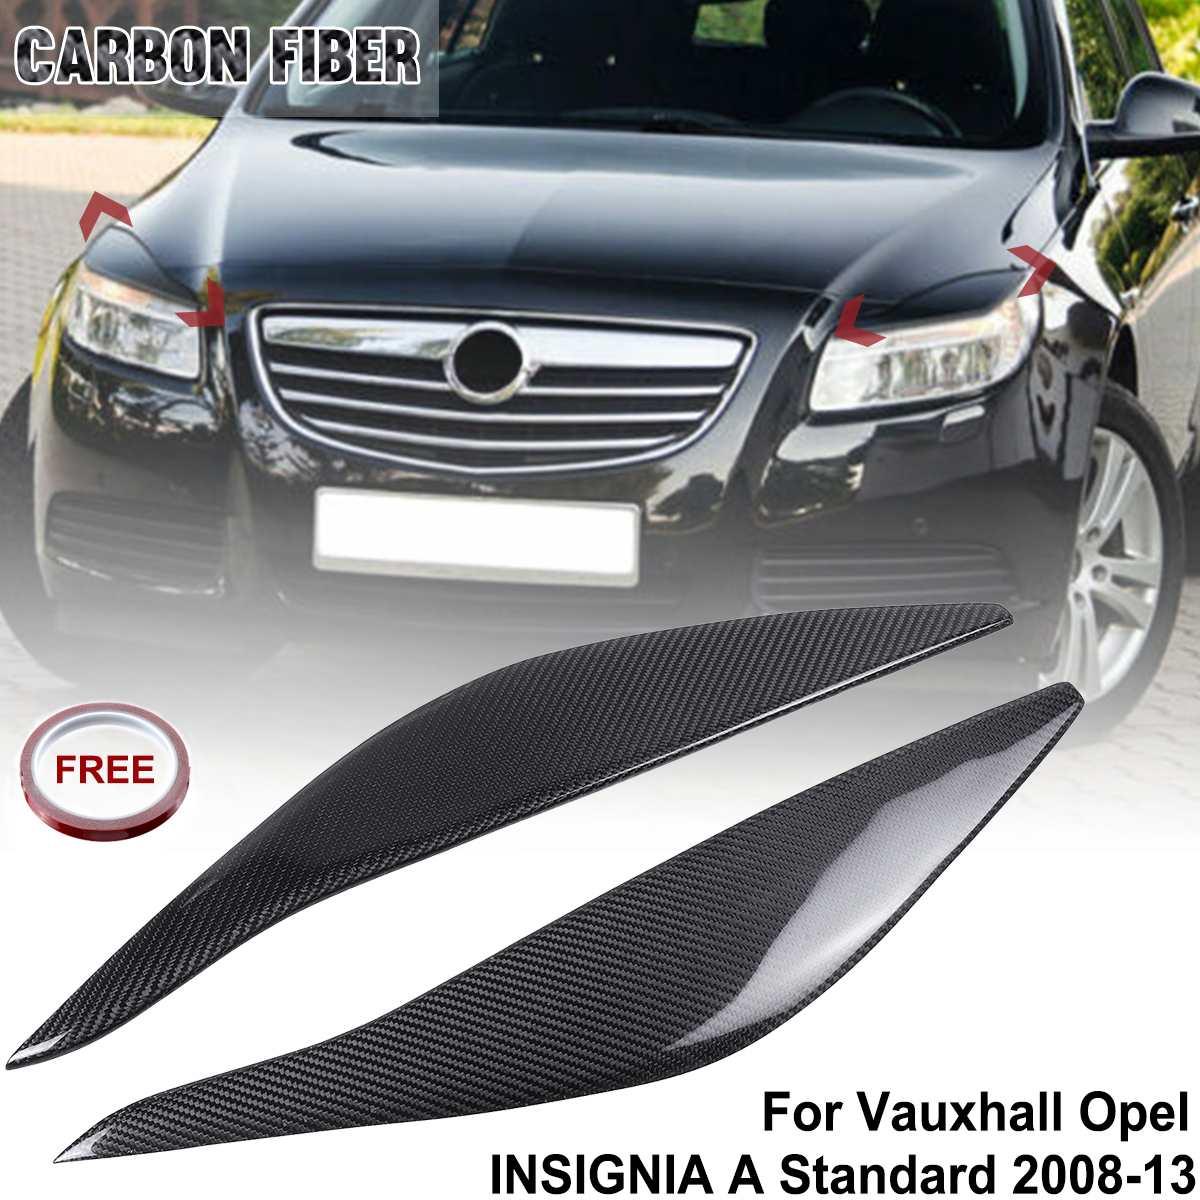 2Pcs Real Carbon Fiber Headlight Eyelids Eyebrows Headlamp Eyebrow Trim For Vauxhall Opel INSIGNIA A Standard 2008-2013